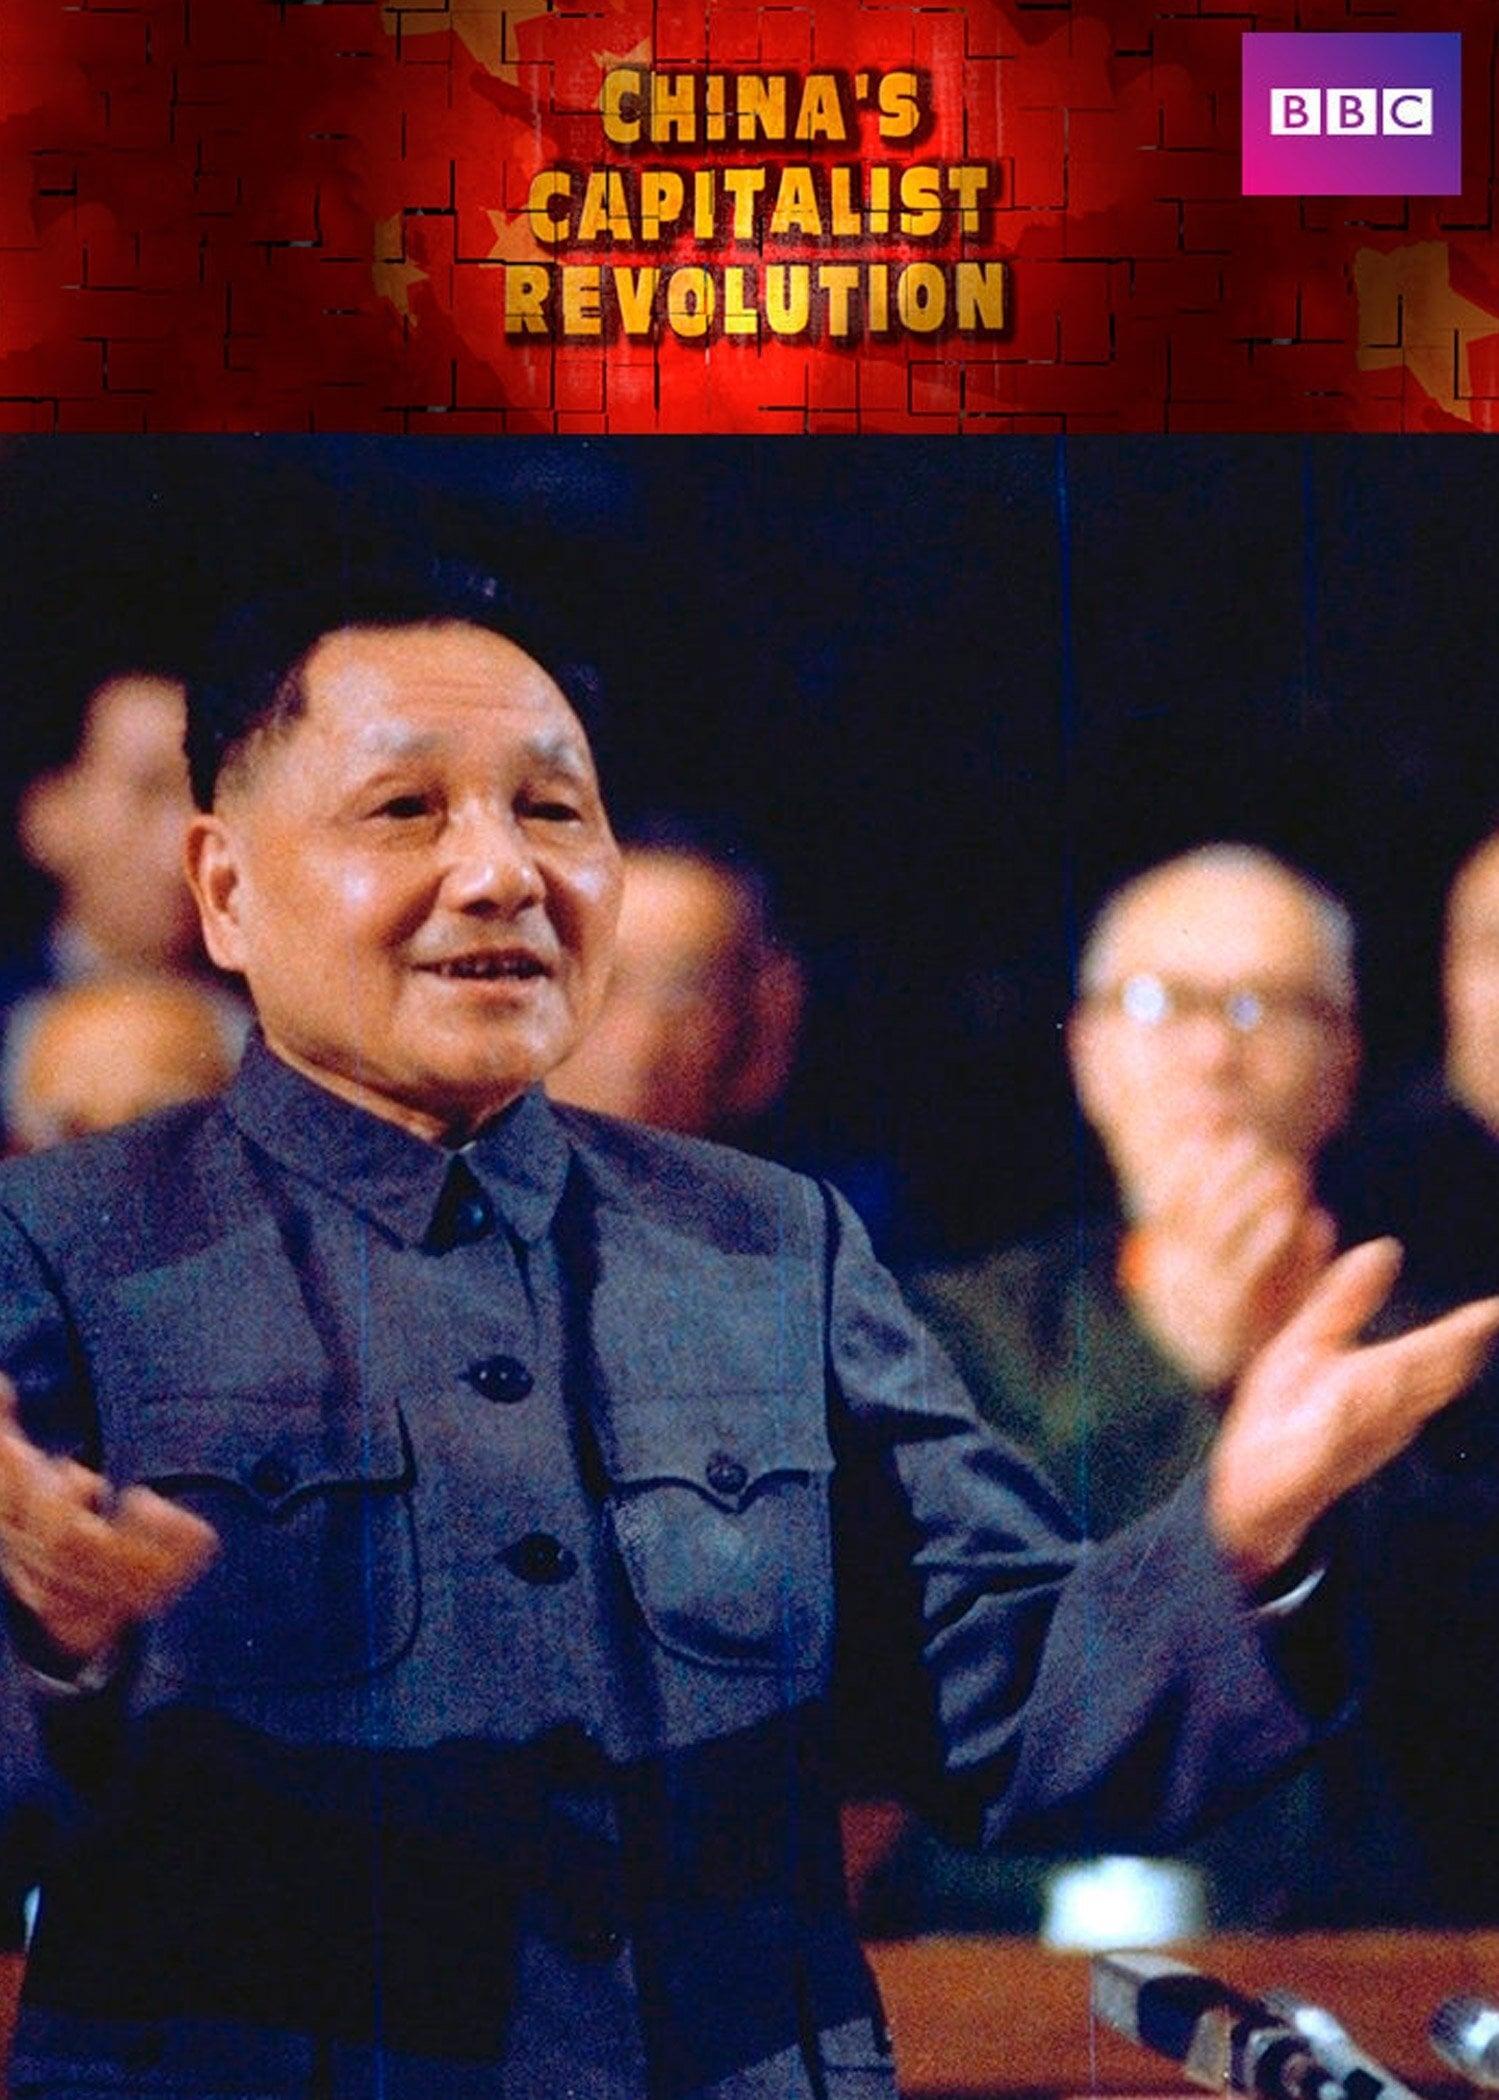 China's Capitalist Revolution